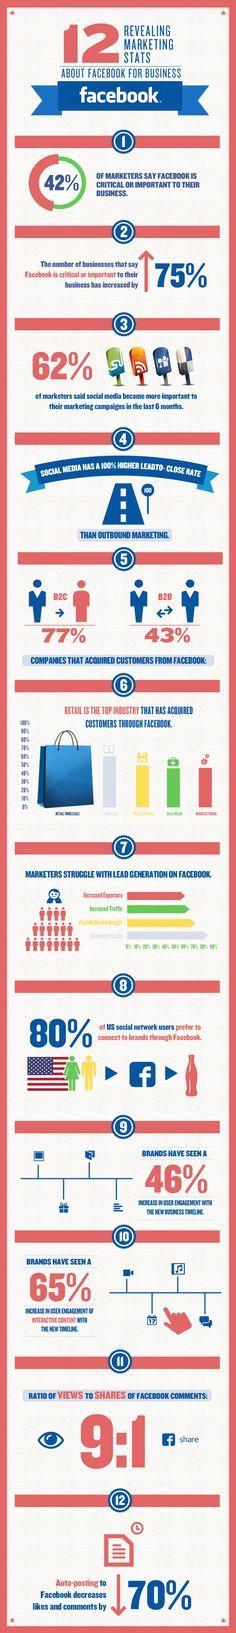 digital marketing, online marketing, internet marketing, marketing online, web marketing, social media marketing, e marketing, online advertising, internet marketing company, online market